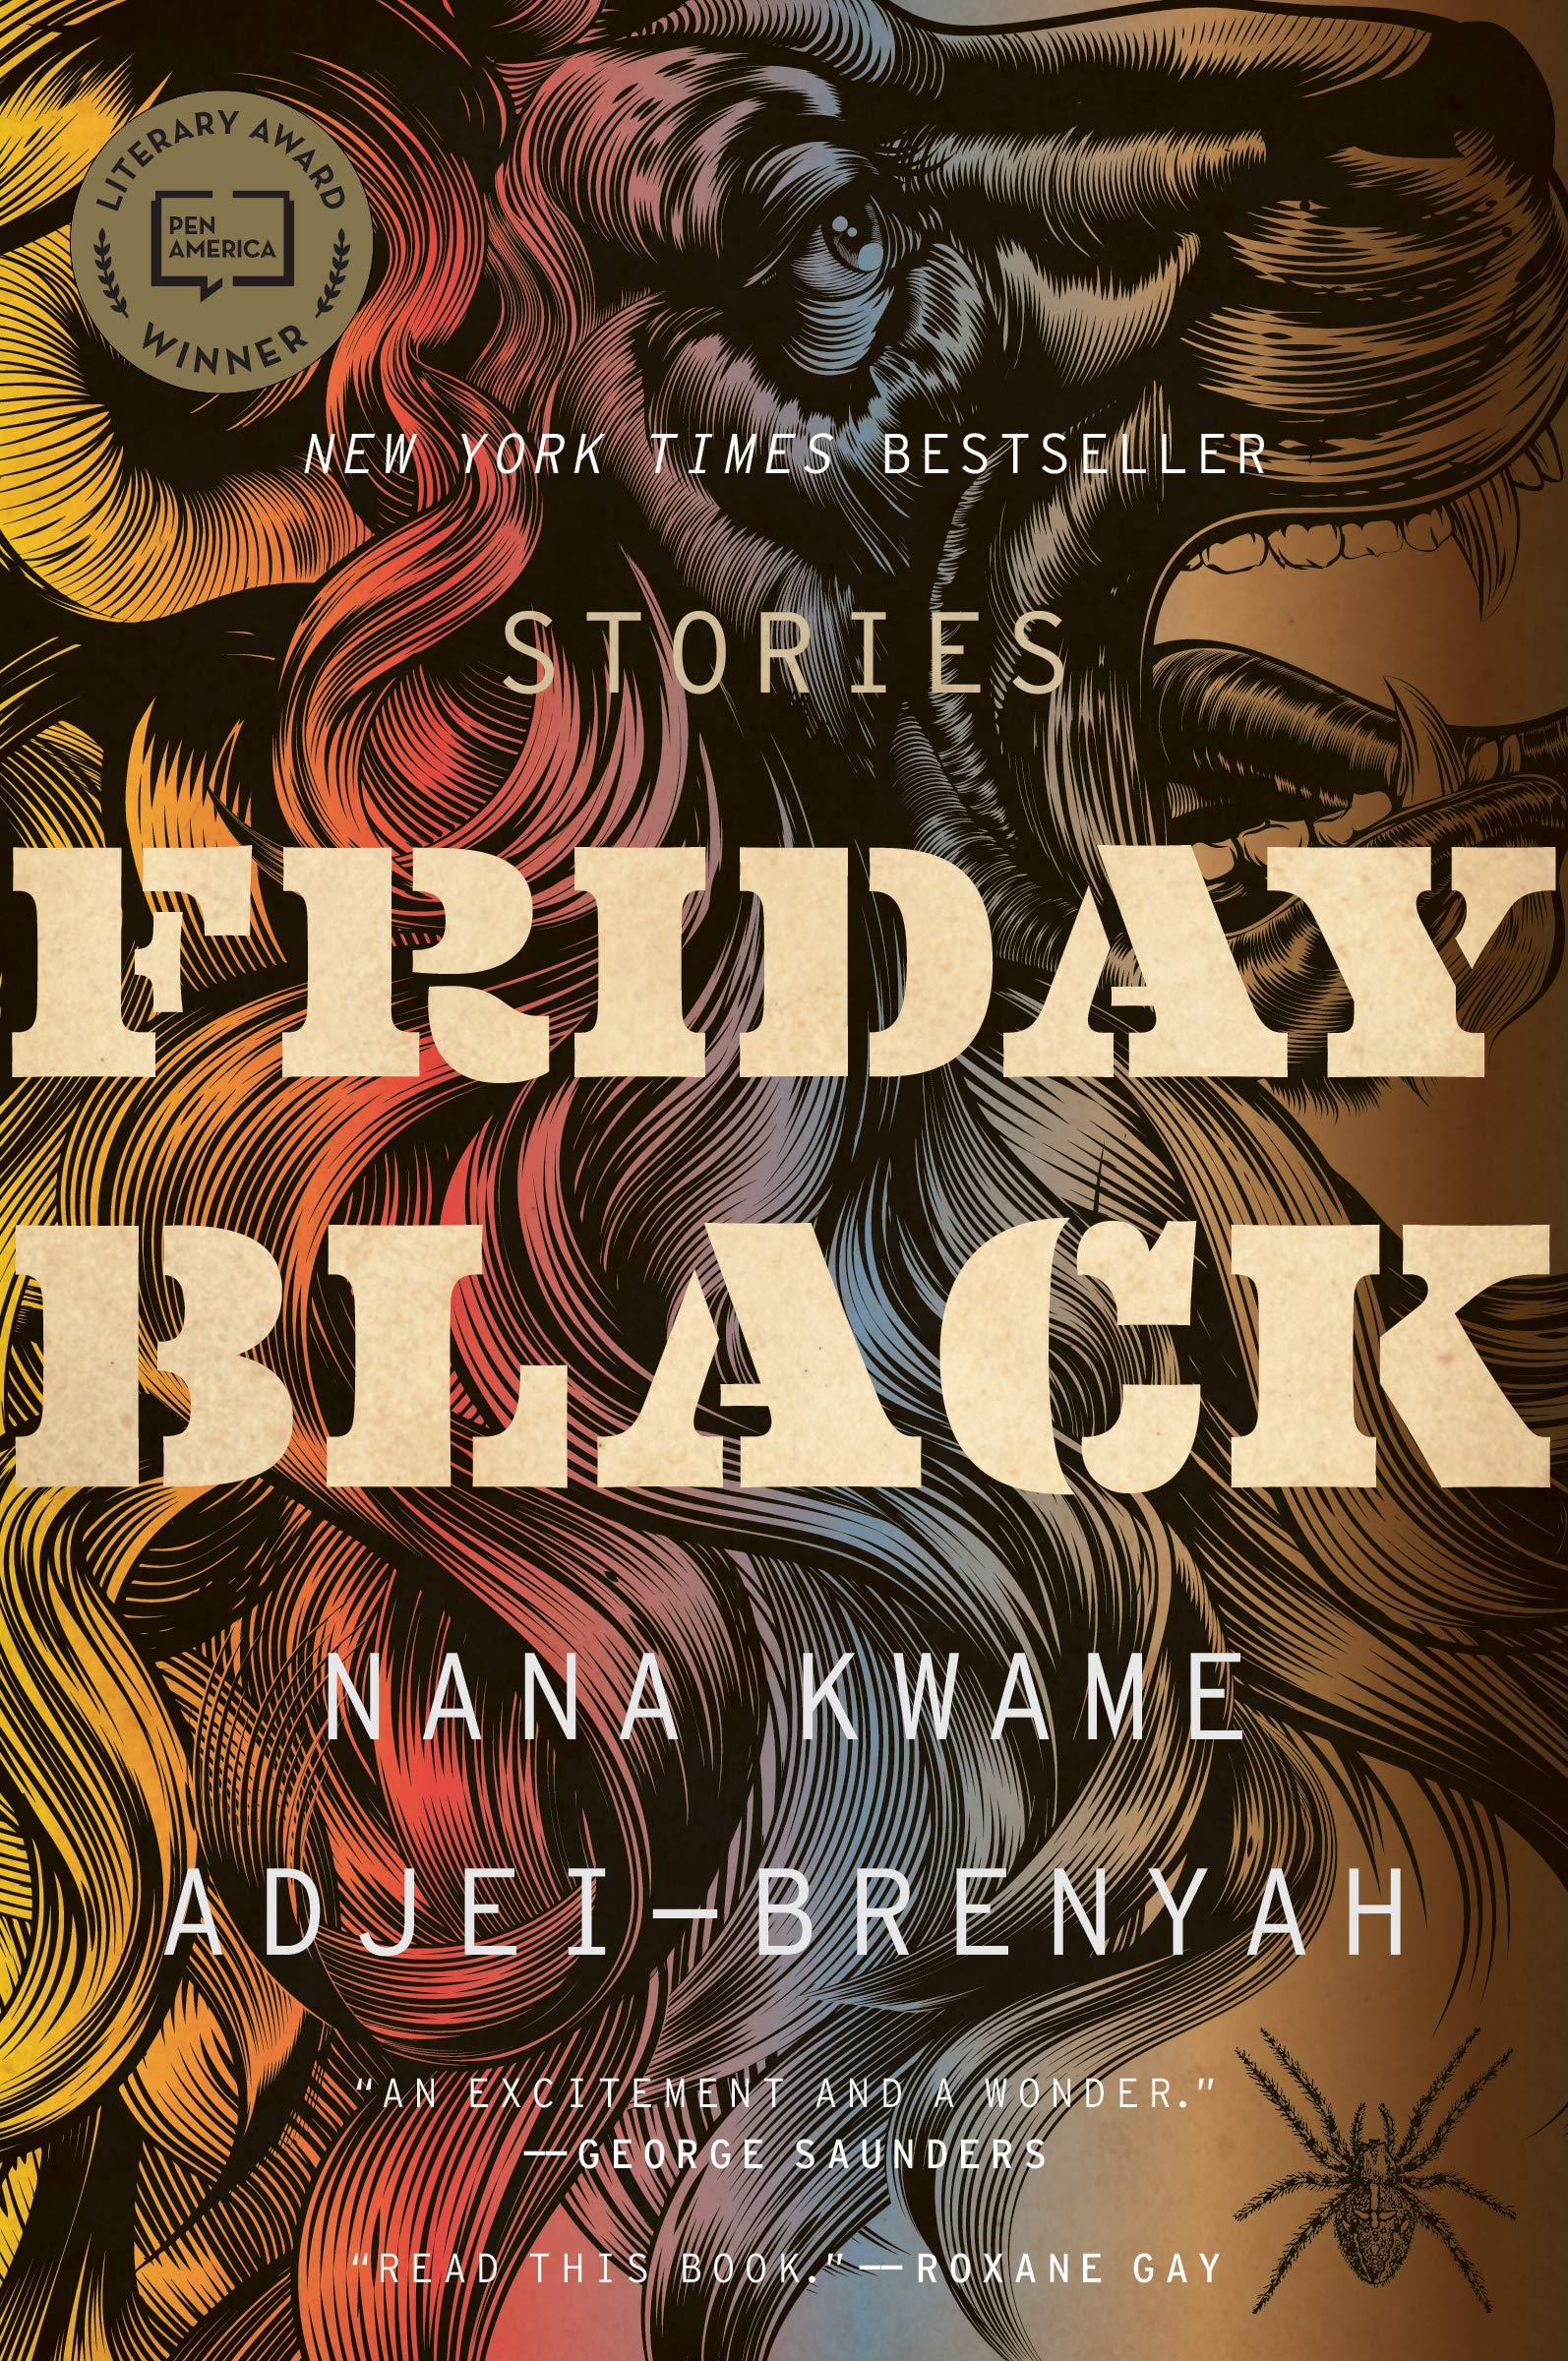 Friday Black: Adjei-Brenyah, Nana Kwame: 9781328911247: Amazon.com: Books